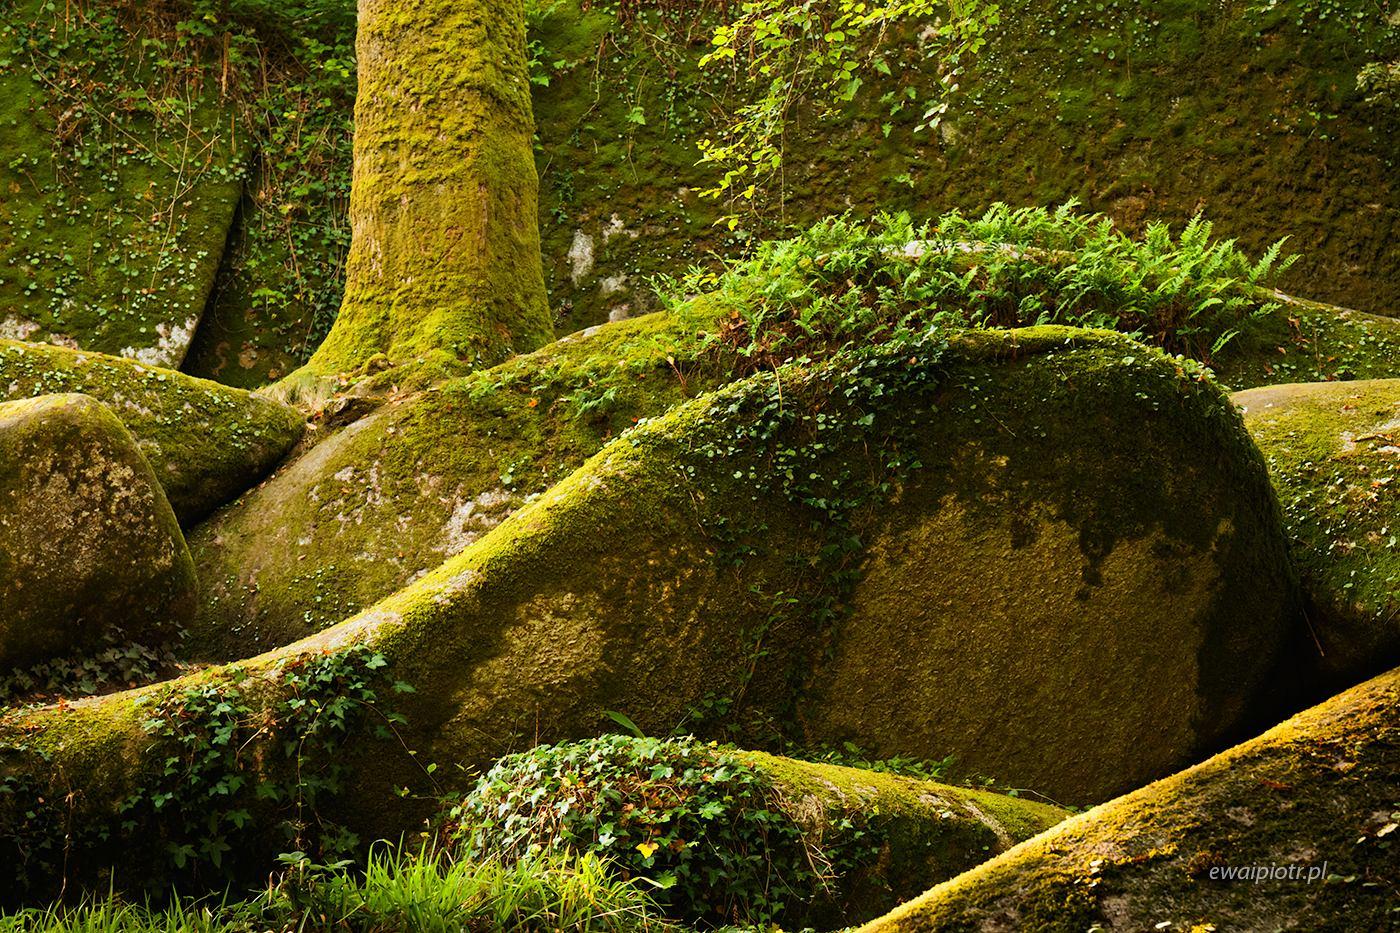 las Huelgoat, Bretania, warsztaty fotograficzne